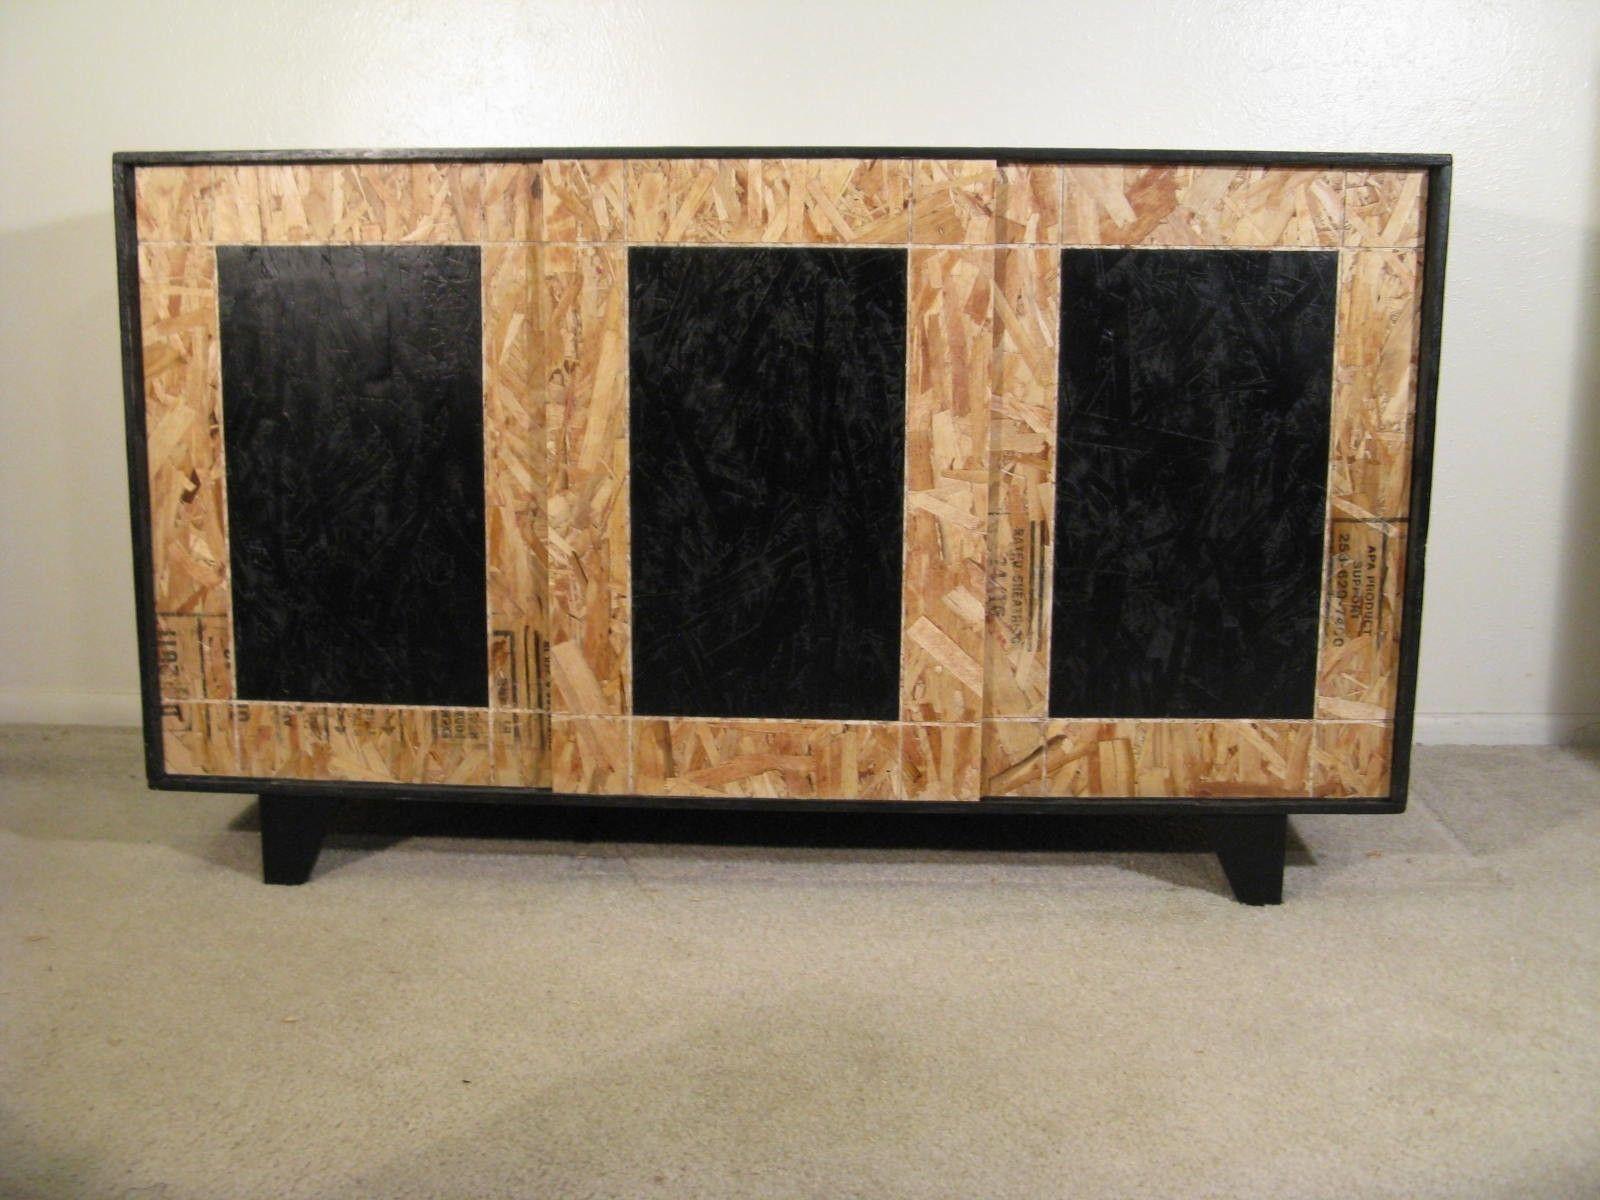 Hand Made Sliding Door Osb Credenza With Hardwood Feet By Modular